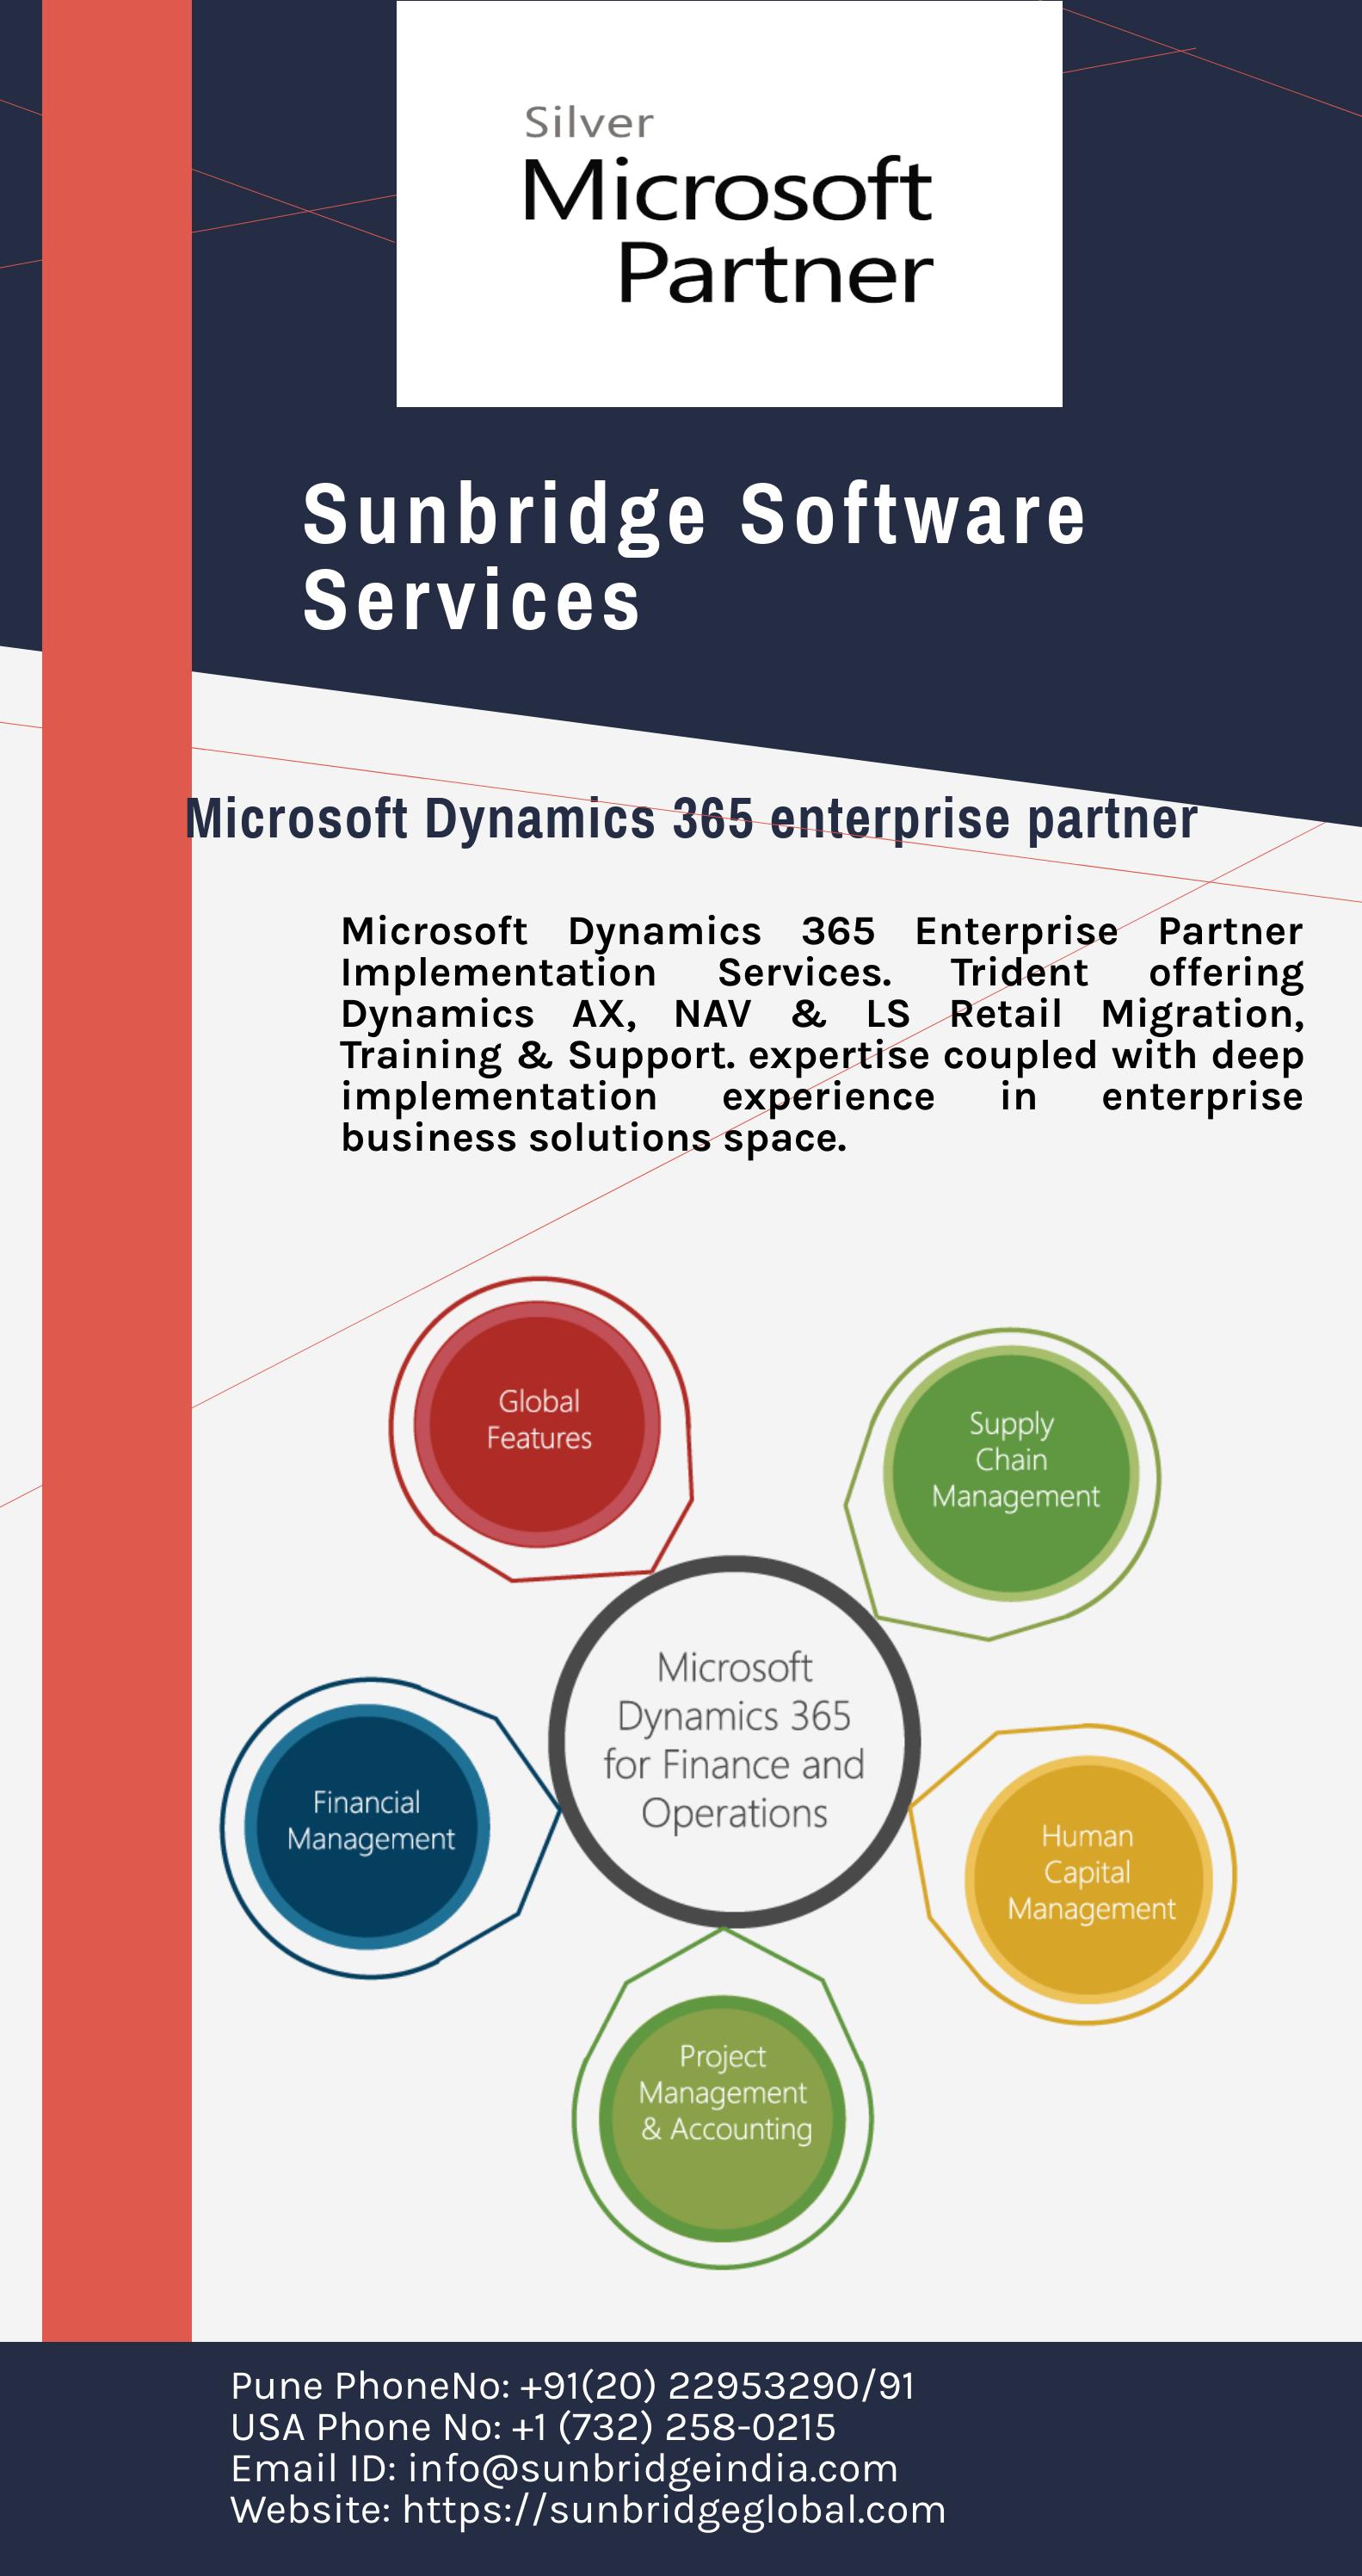 Sunbridge Software Services Pvt  Ltd  is your trusted partner for